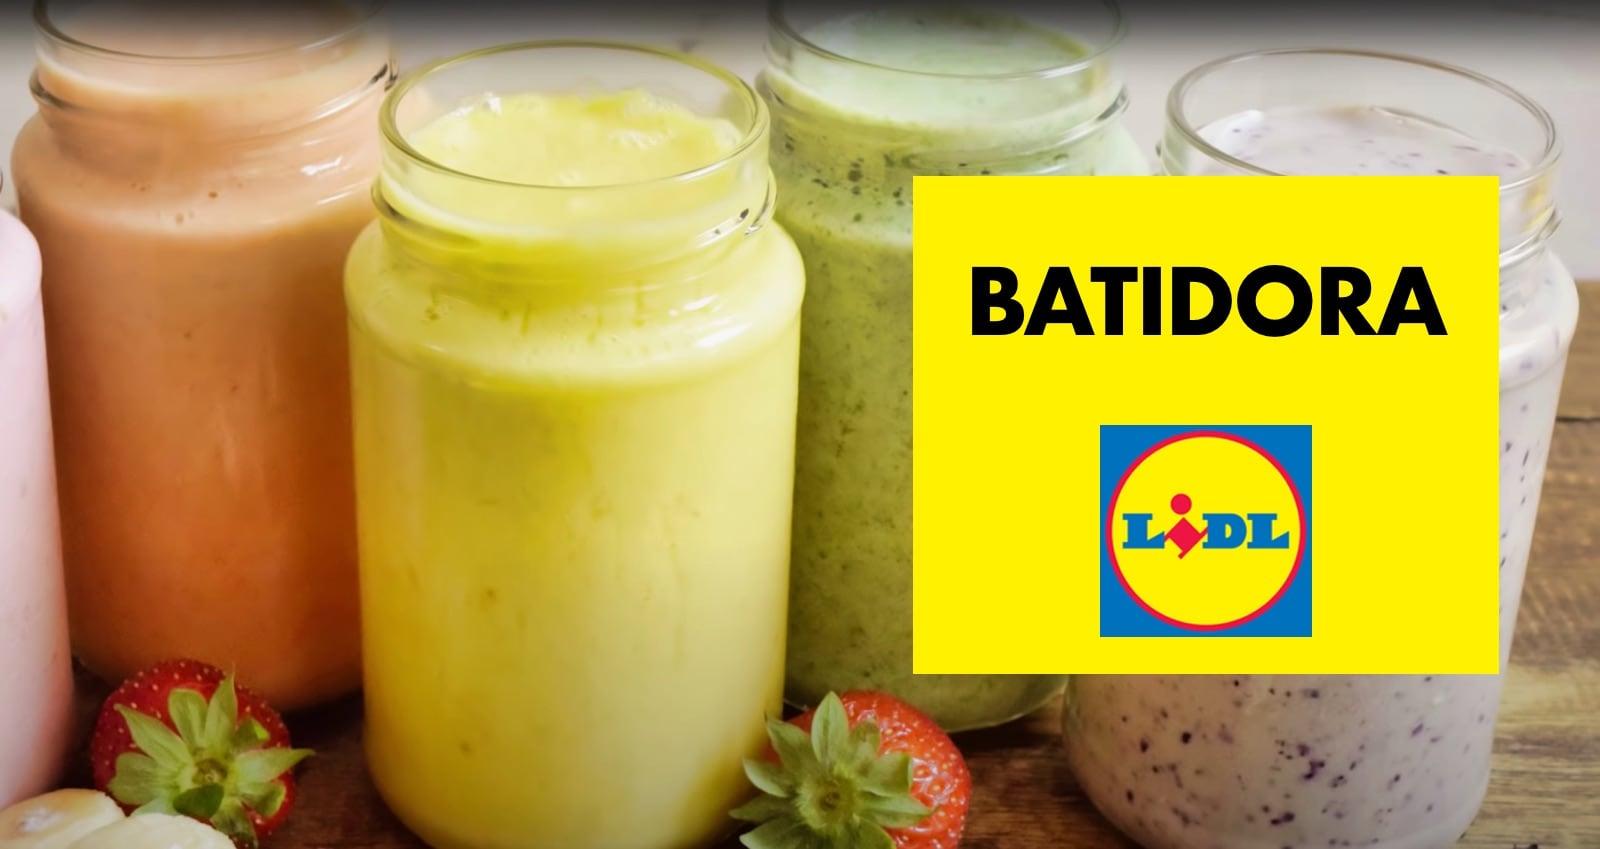 Batidora Silvercrest® del Lidl